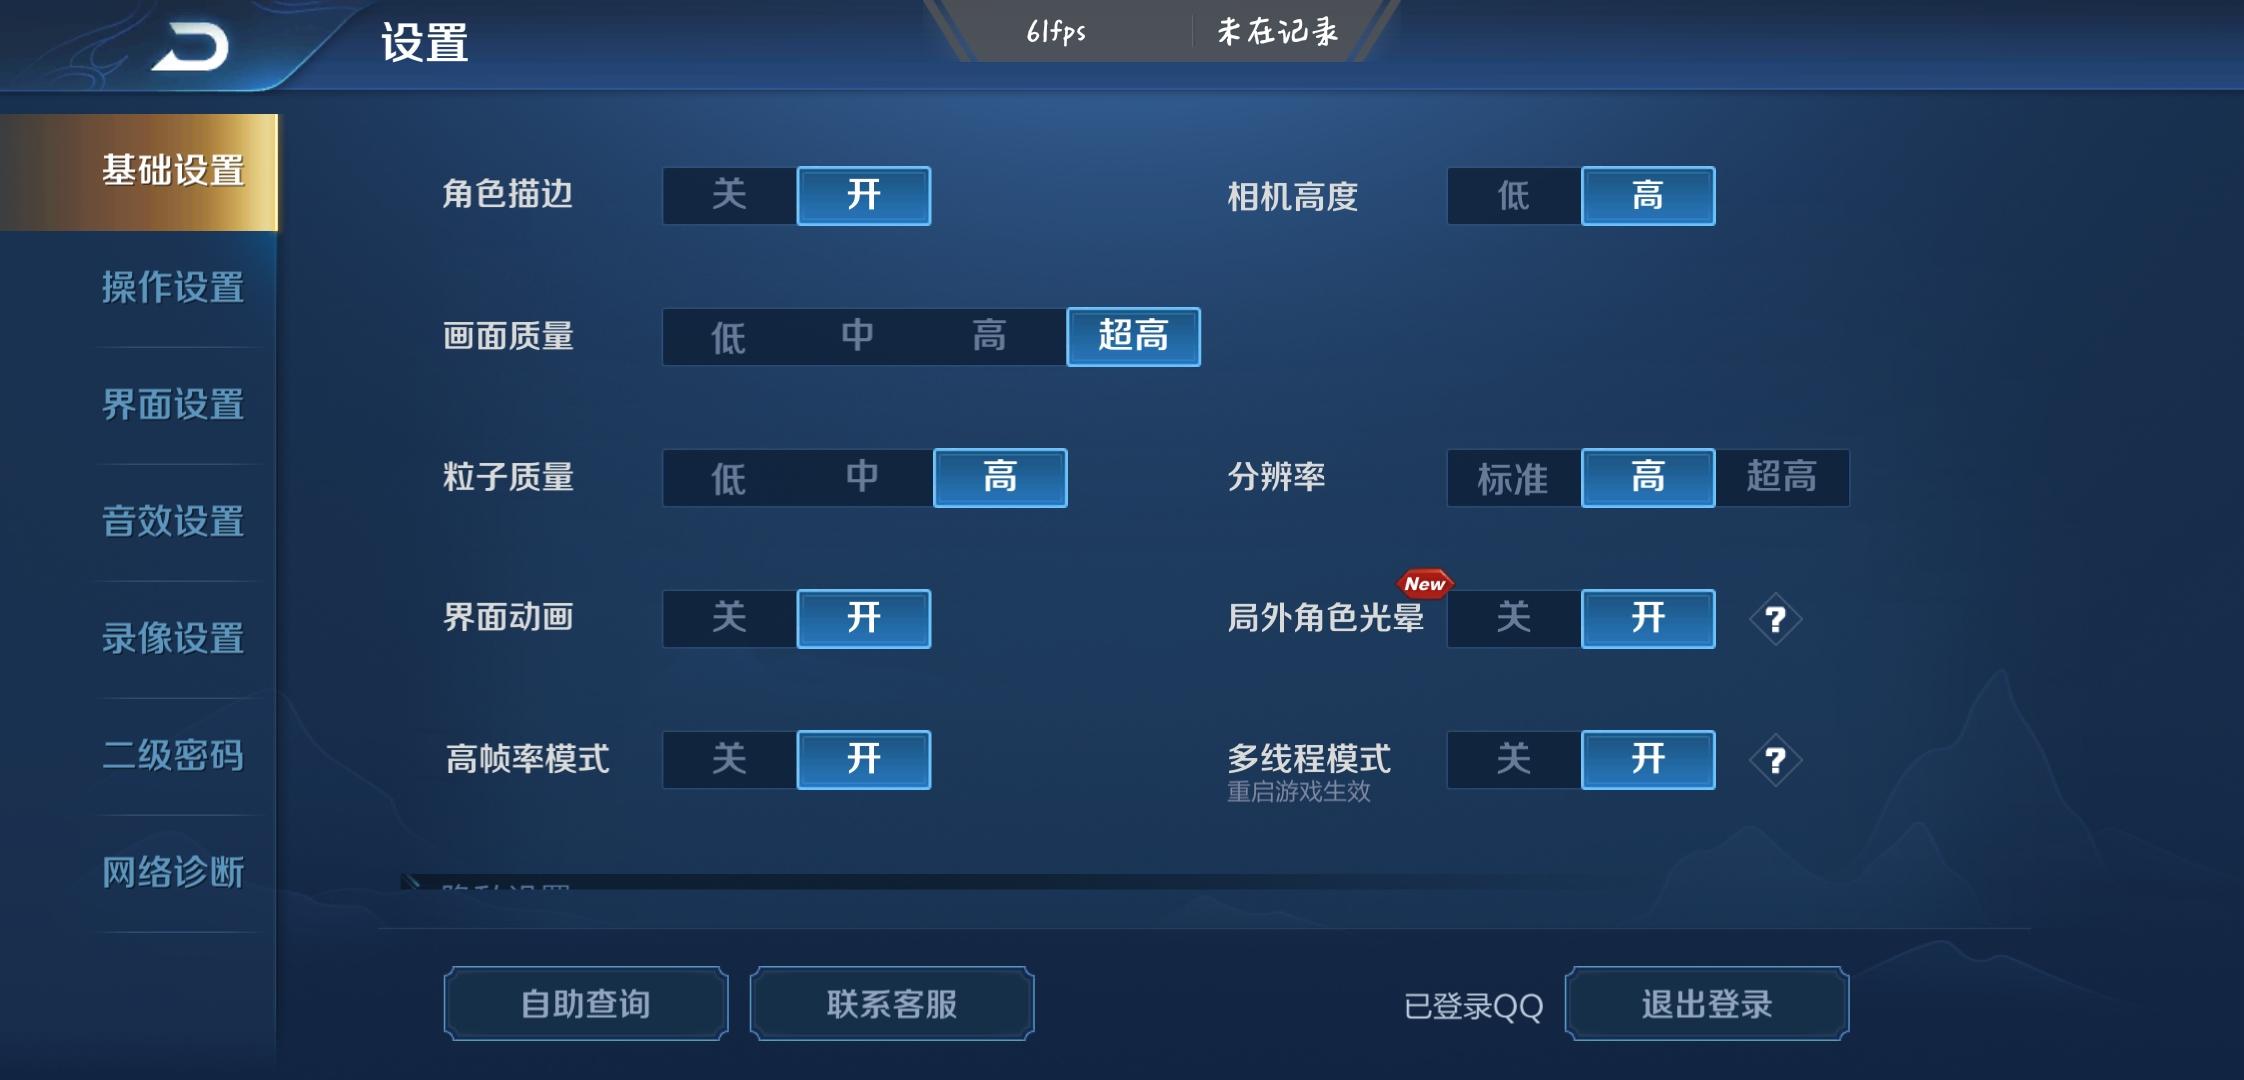 Screenshot_20190123_165323_com.tencent.tmgp.sgame.jpg